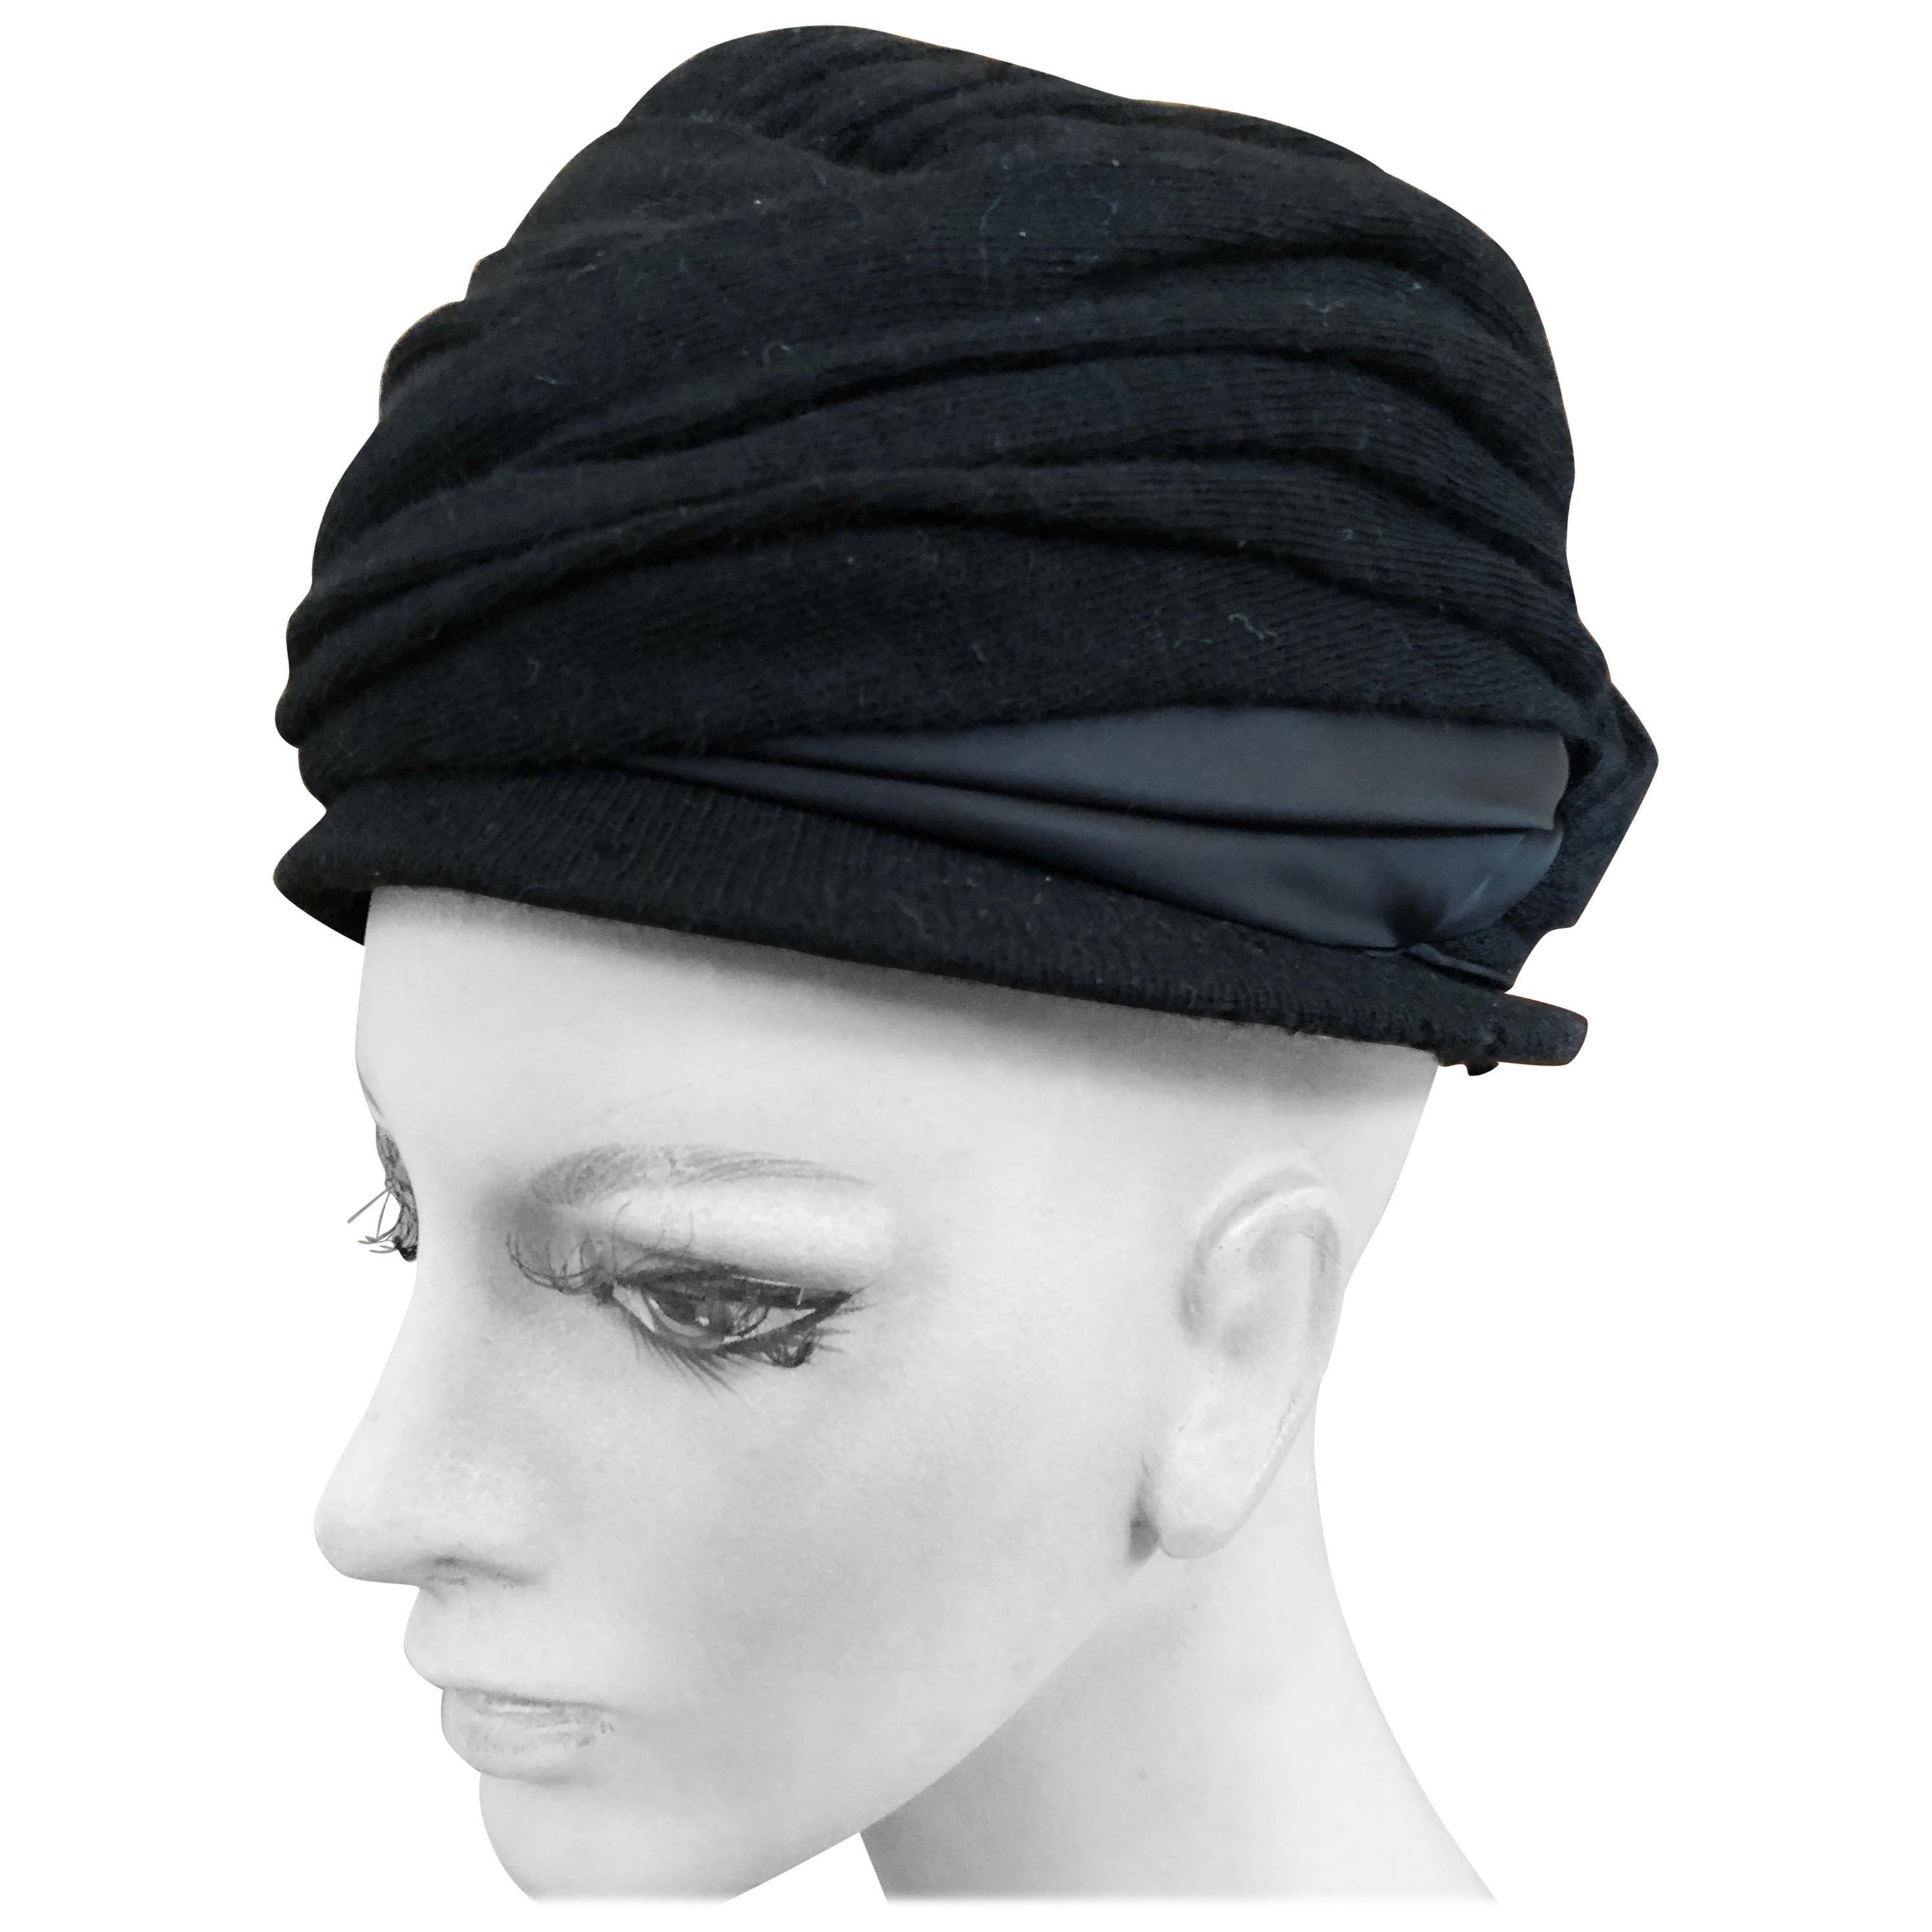 ebe674b16 Vintage Christian Dior Hats - 51 For Sale at 1stdibs